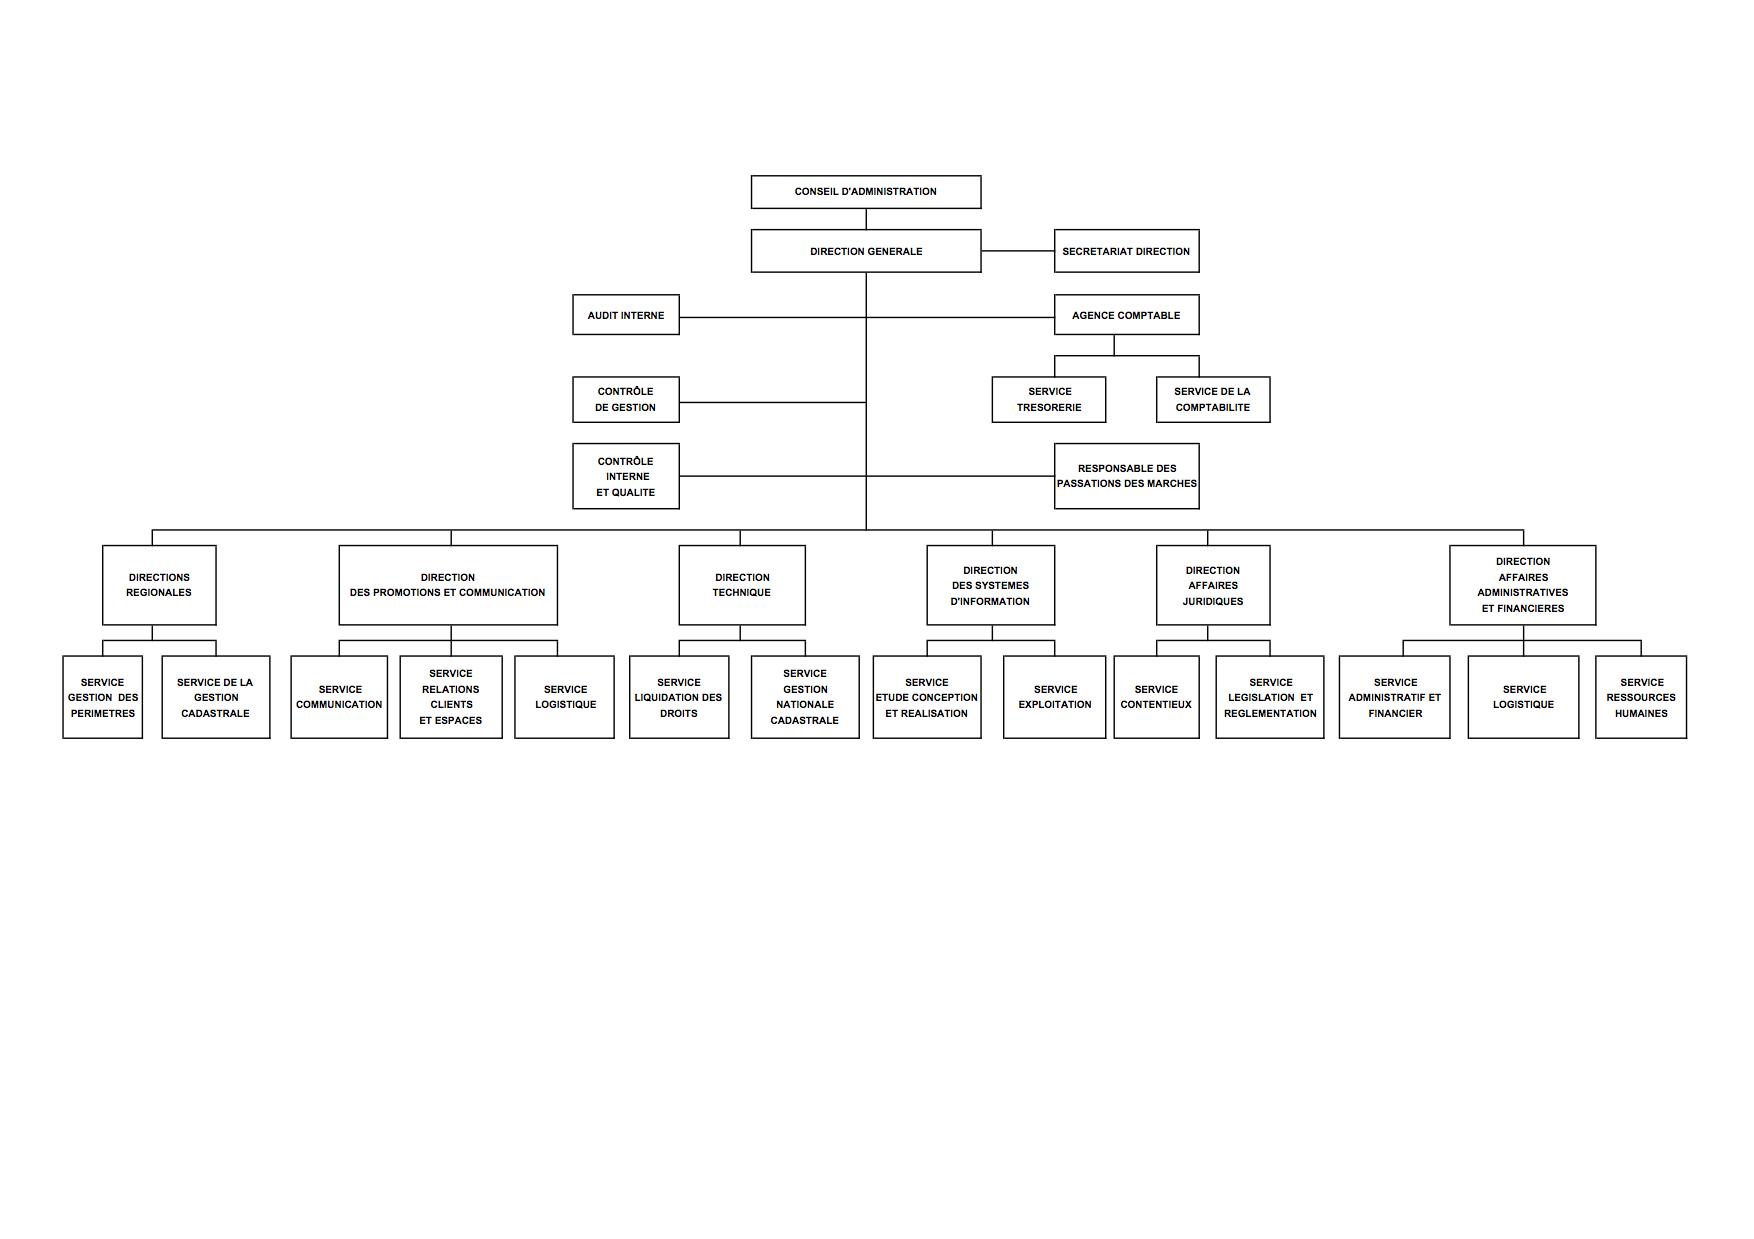 ORGANIGRAMME DU BCMM (BUREAU DU CADASTRE MINIER DE MADAGASCAR)